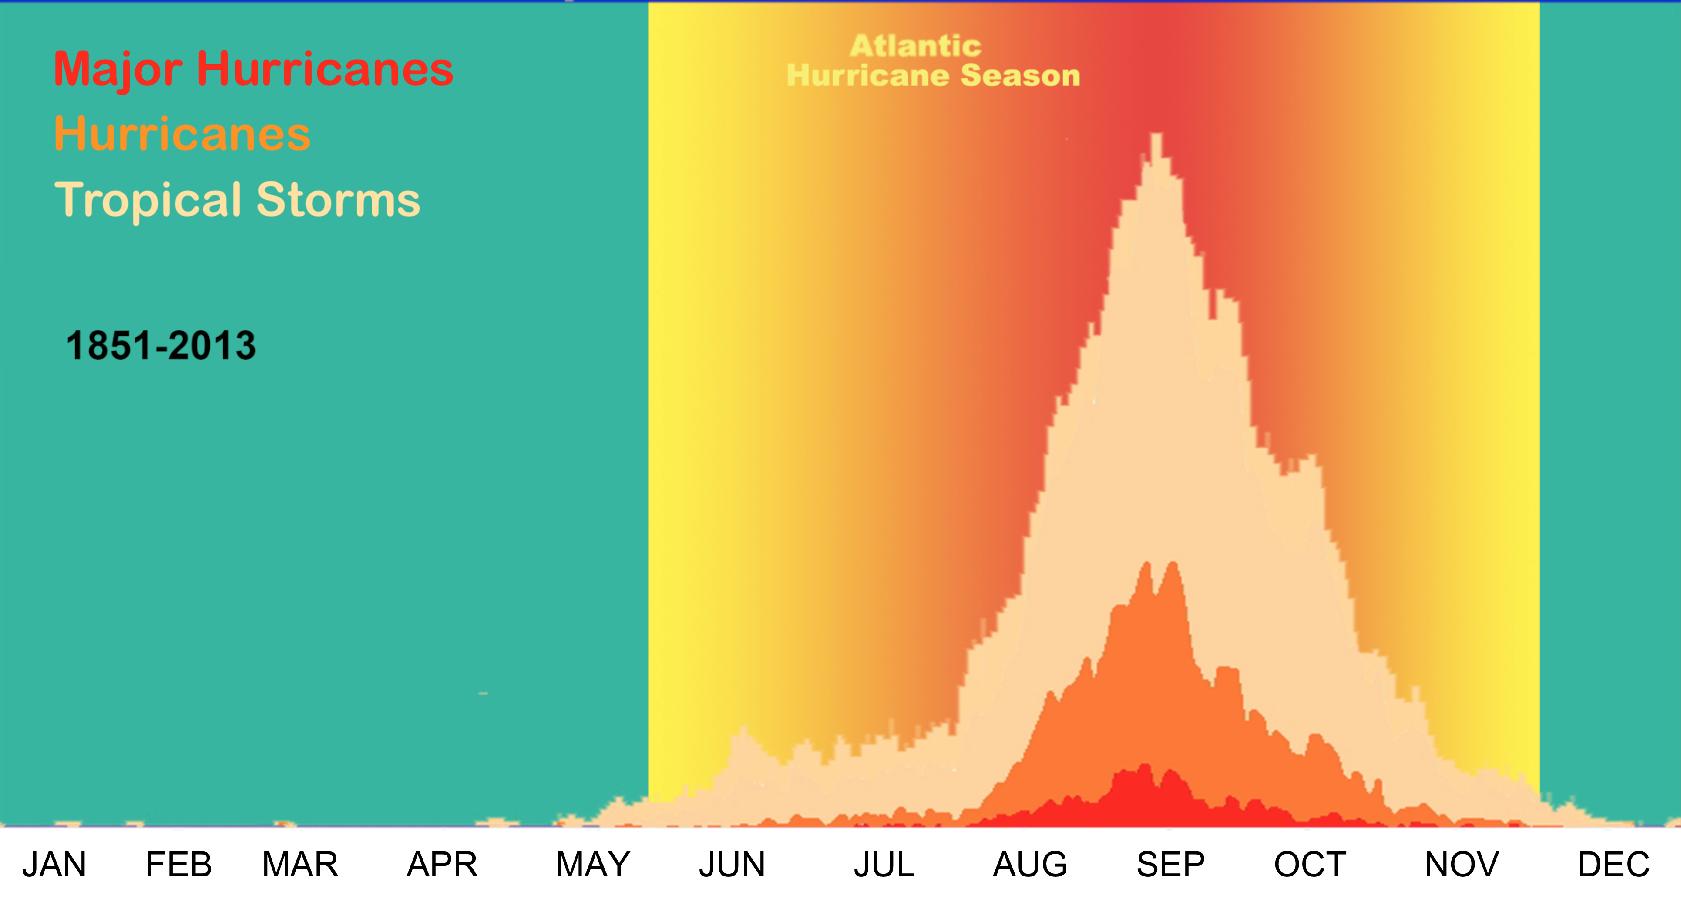 Hurricane season dates in Sydney